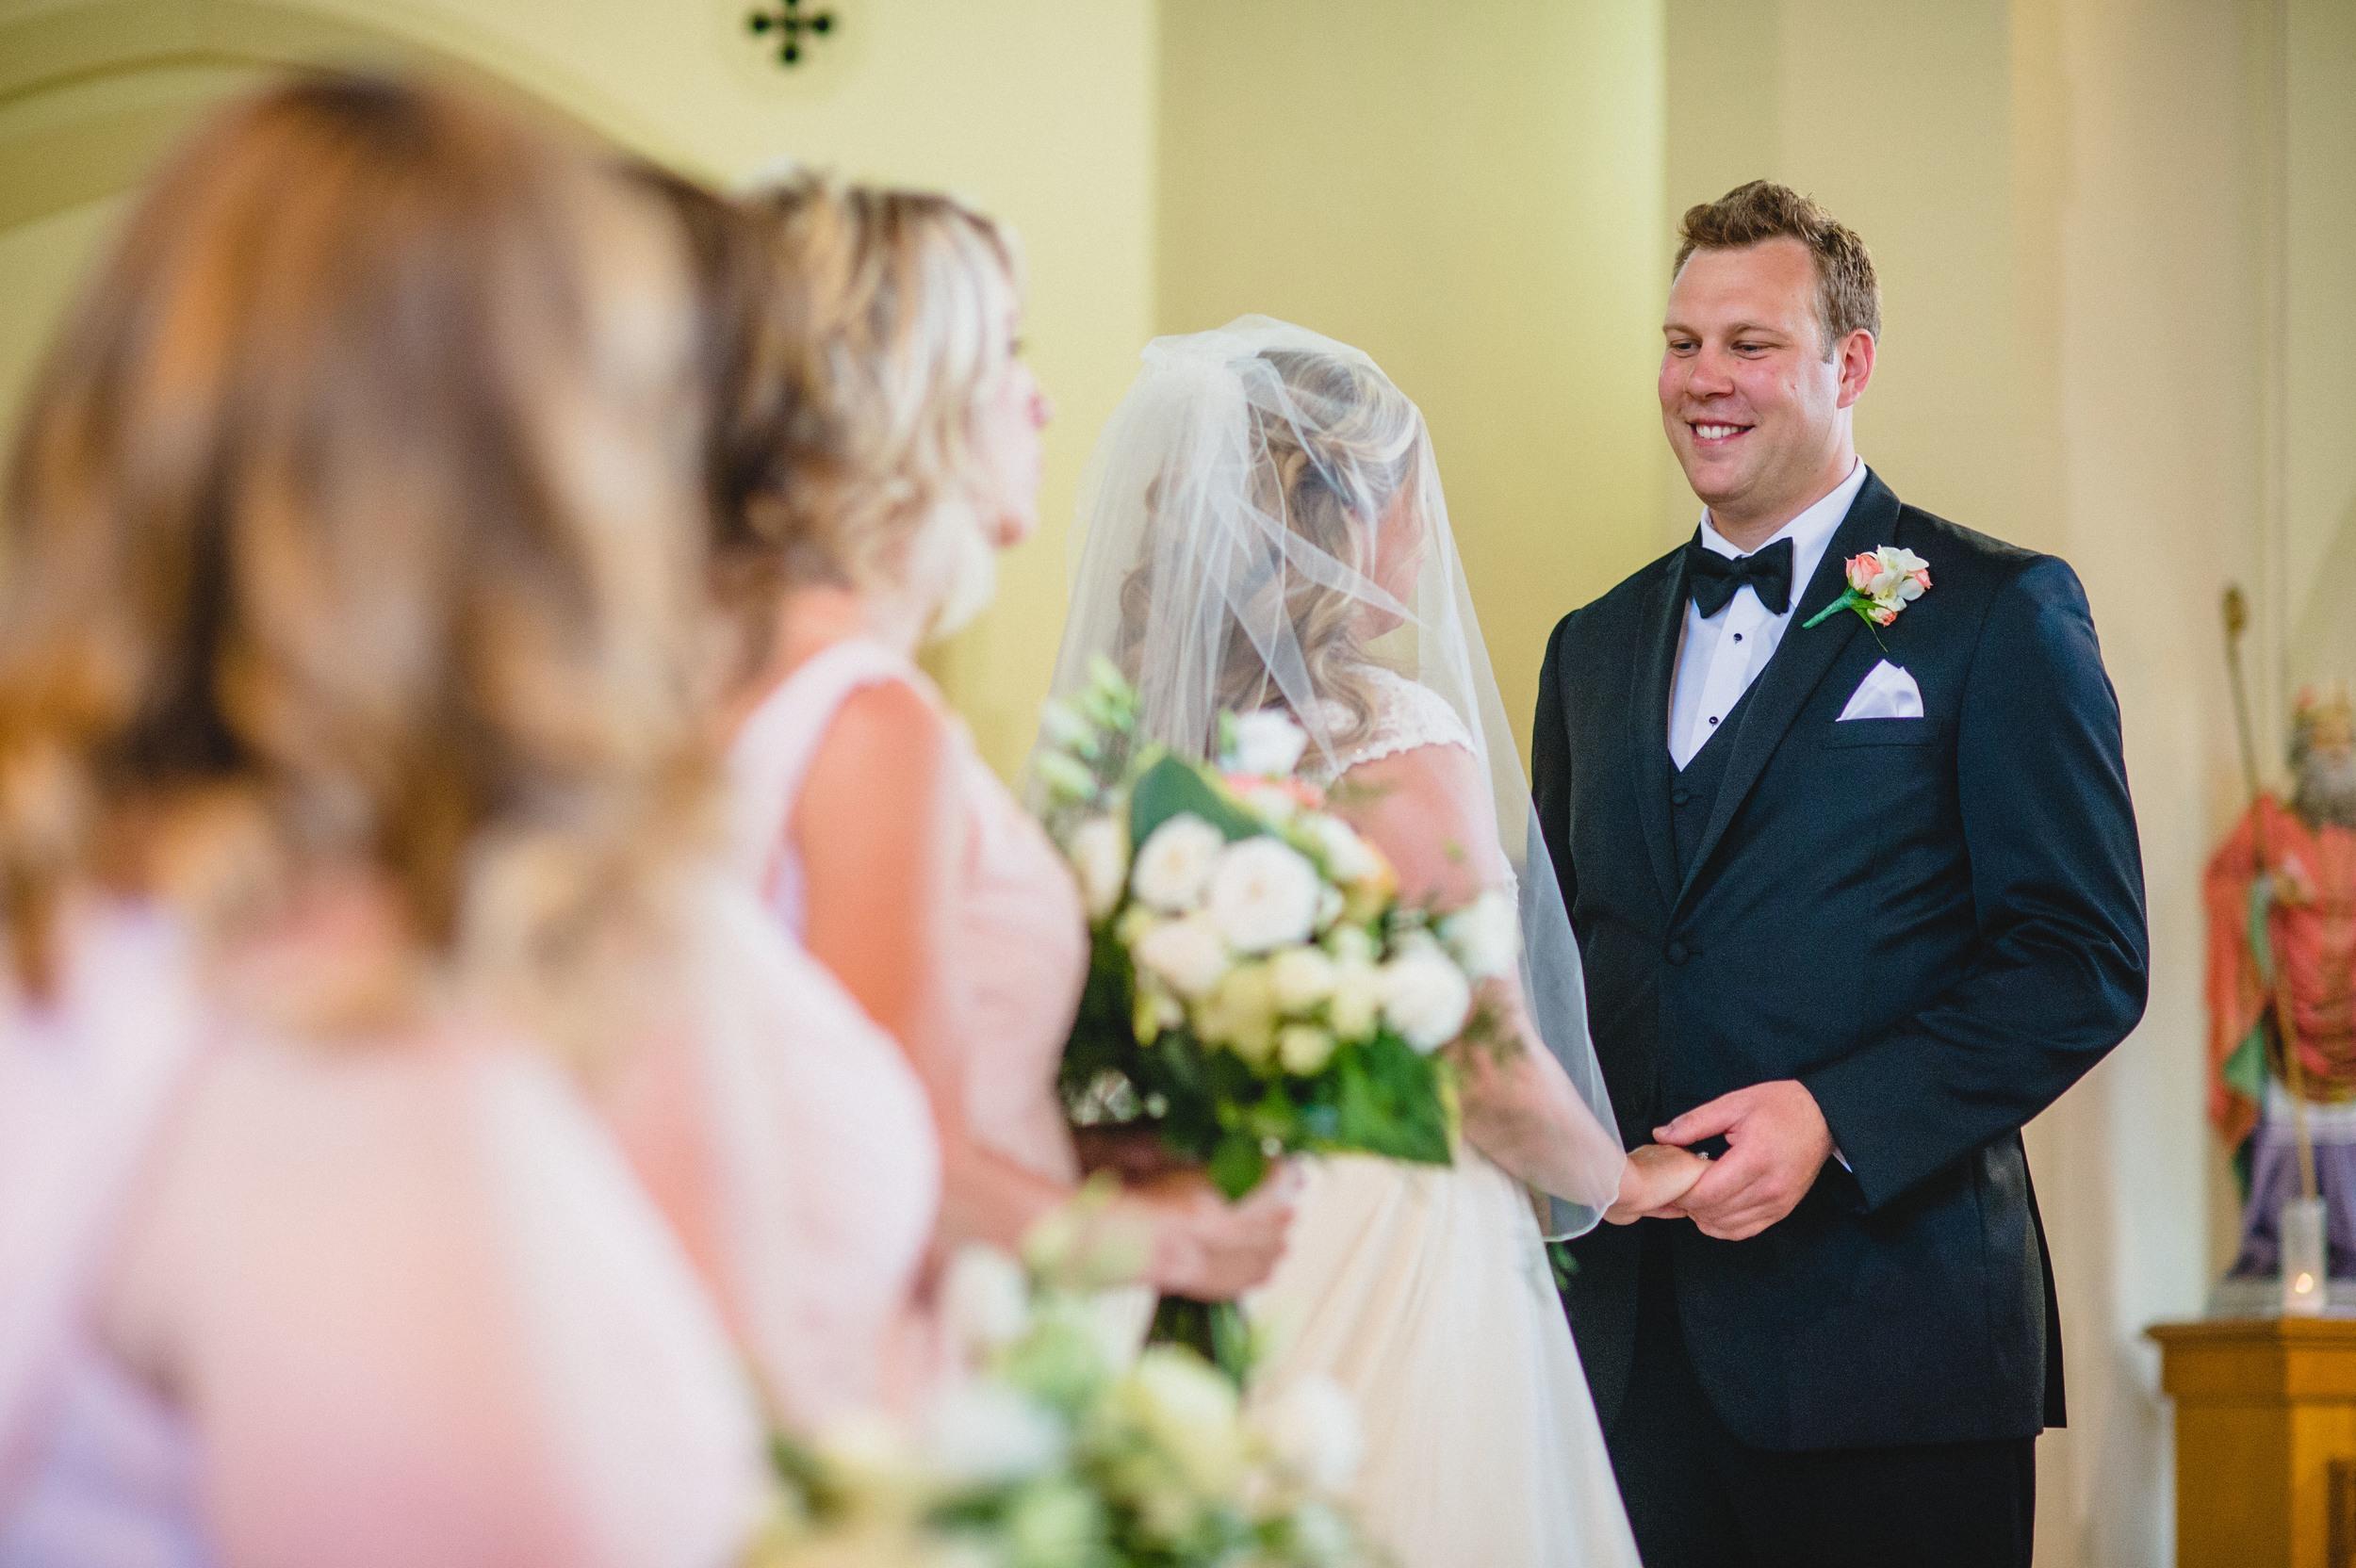 Vancouver St Augustine 's Church wedding photographer edward lai photography-45.jpg